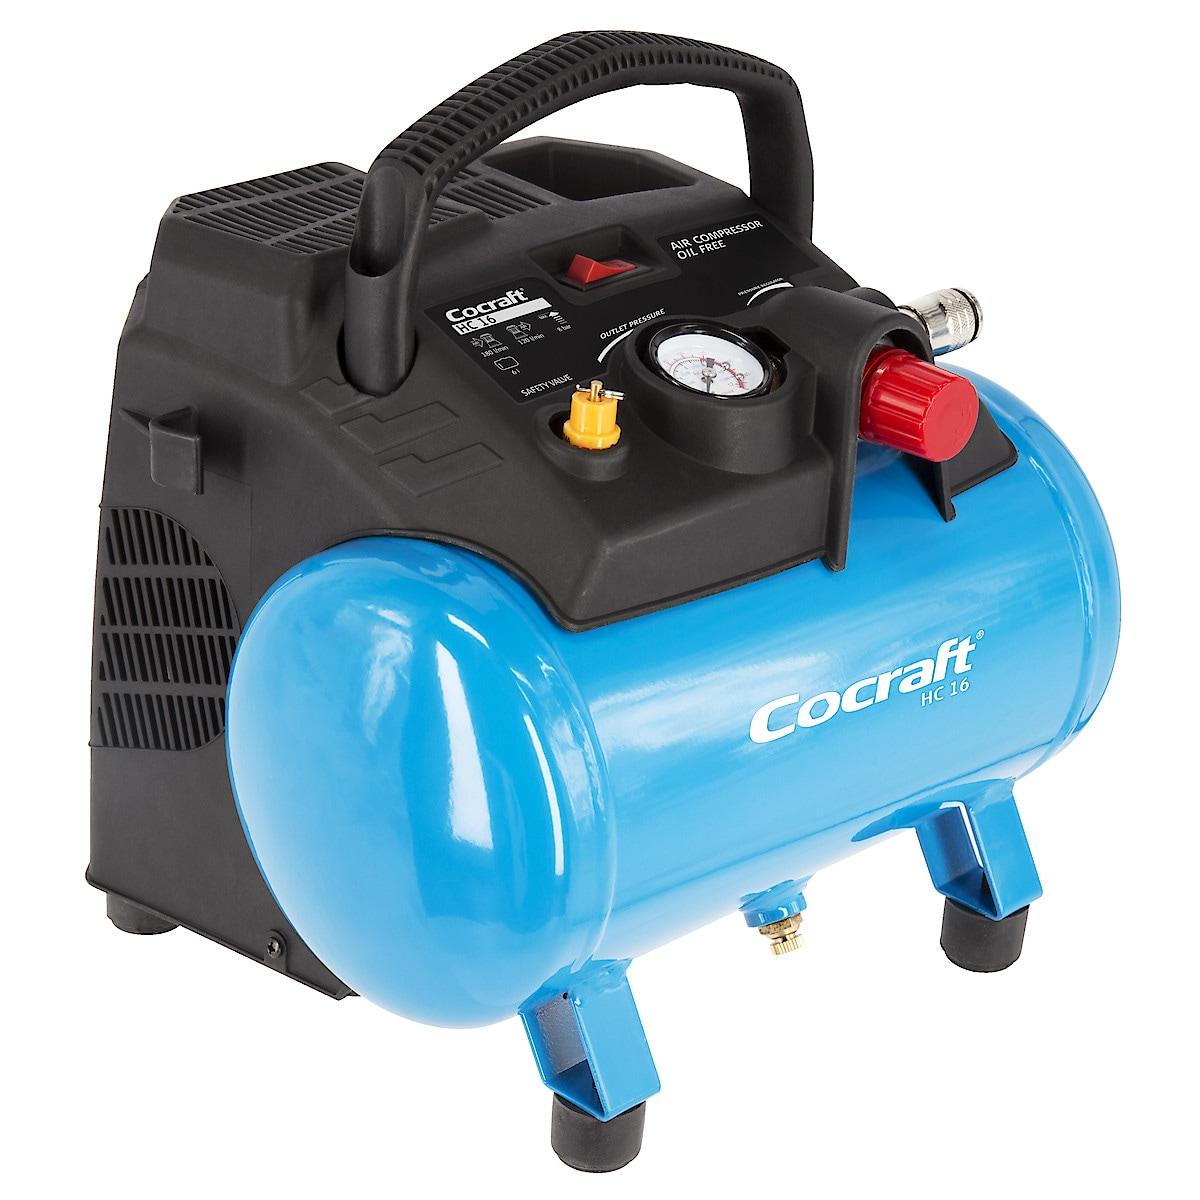 Cocraft HC 16 kompressor